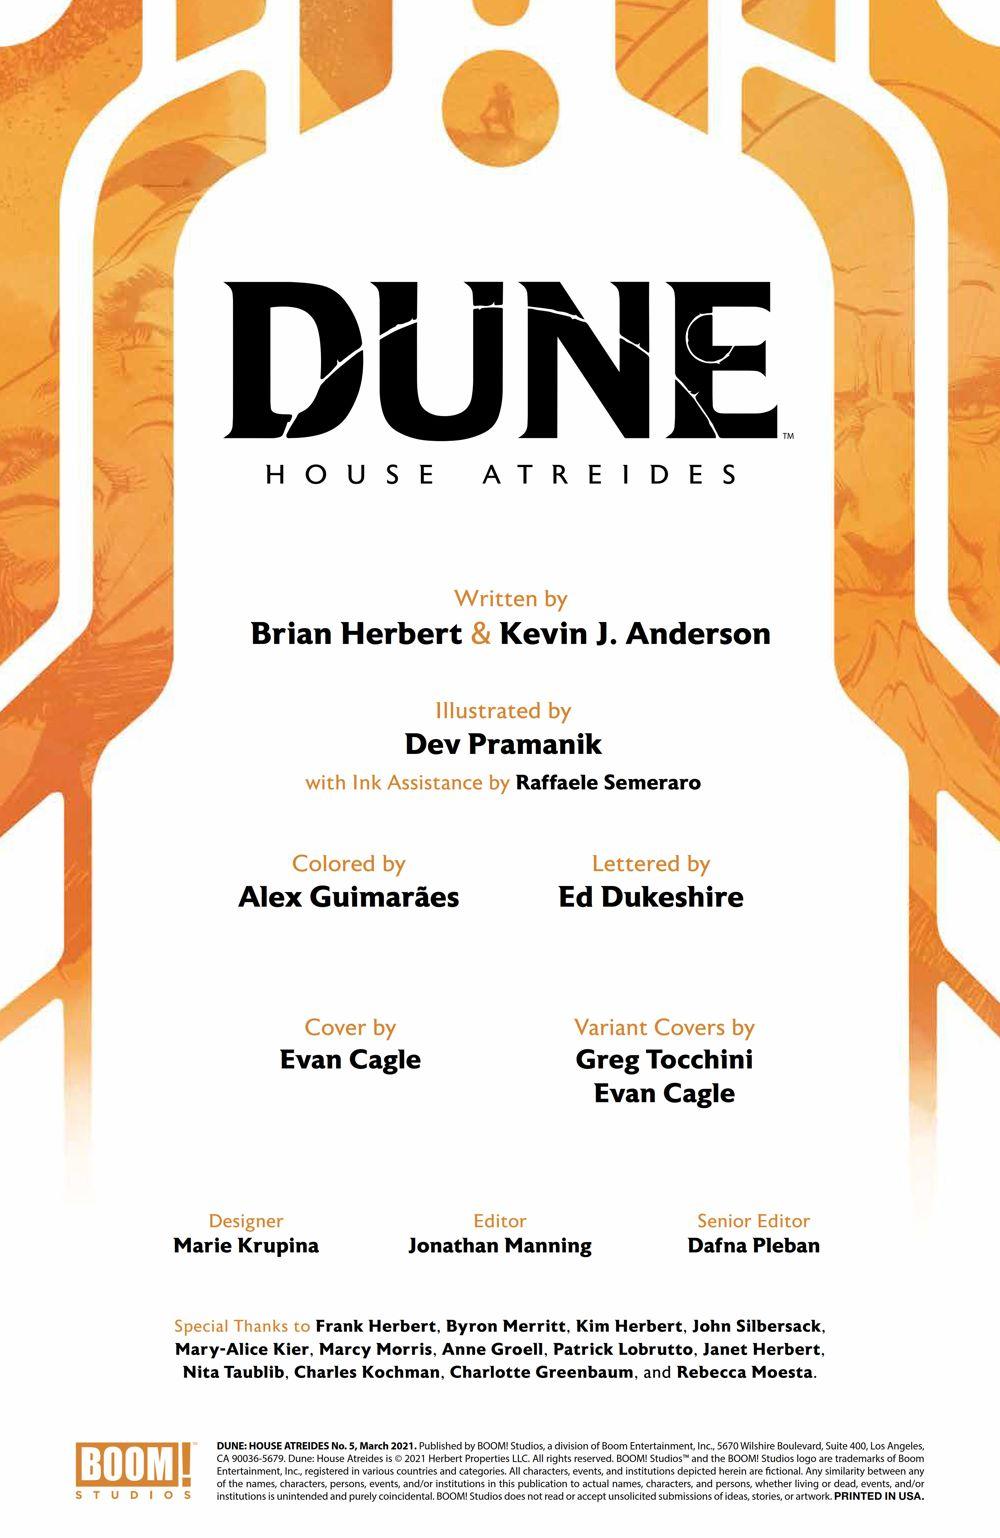 Dune_HouseAtreides_005_PRESS_2 ComicList Previews: DUNE HOUSE ATREIDES #5 (OF 12)